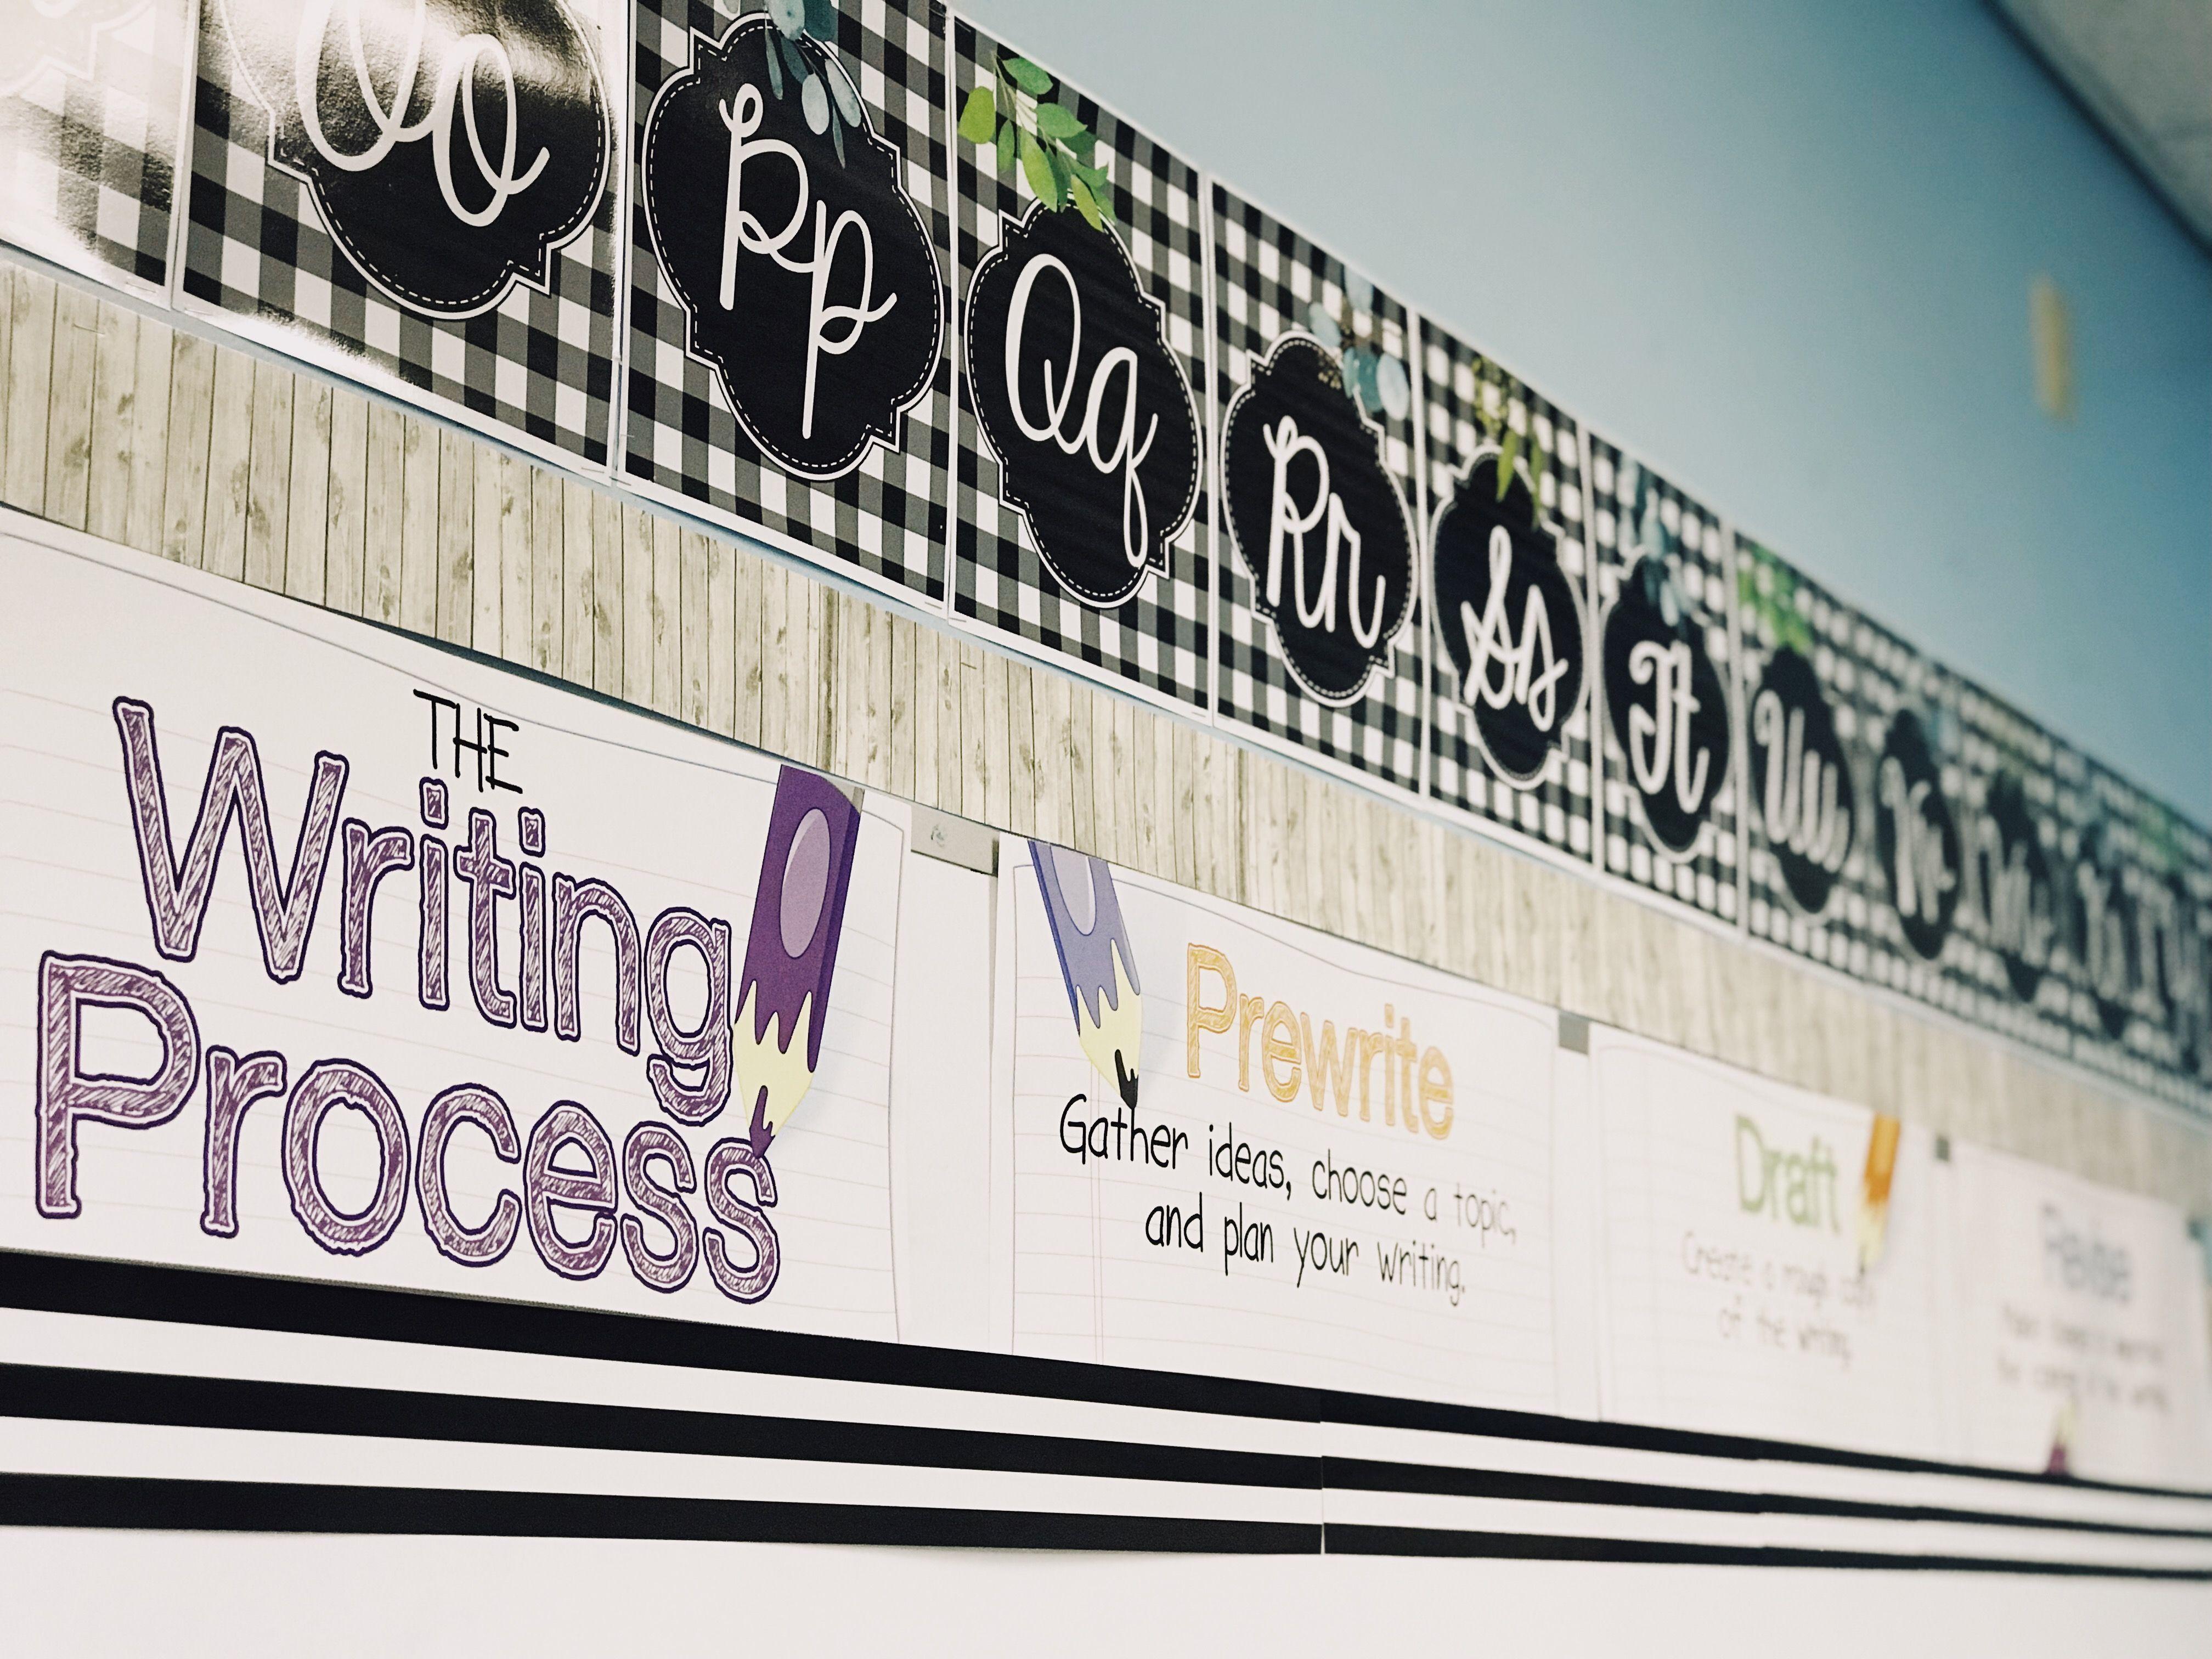 Writing Wall Cursive Alphabet Schoolgirlstyle Rustic